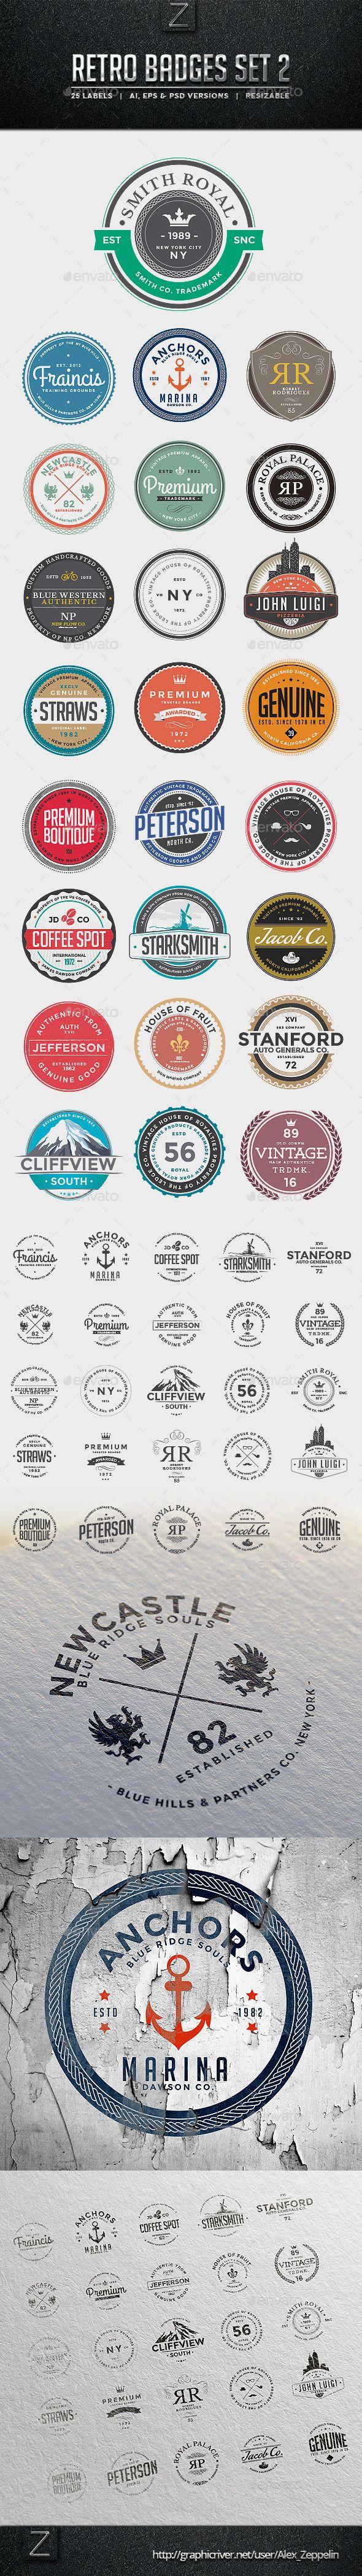 Retro Badges Set   #retrobadges #retro #badges  Download: http://graphicriver.net/item/retro-badges-set-2/10070679?ref=ksioks